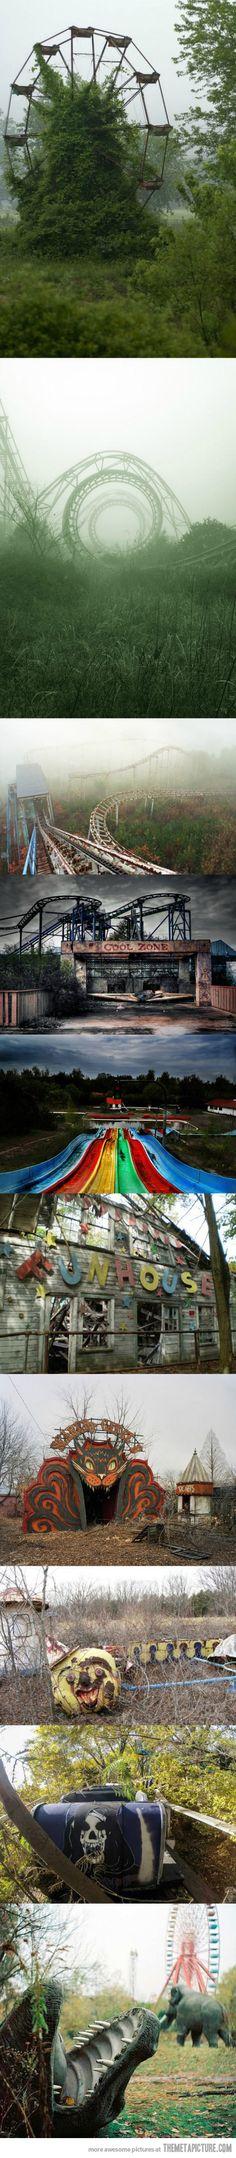 Creepy-Photos-of-Abandoned-Amusement-Parks…-wallpaper-wp3404268